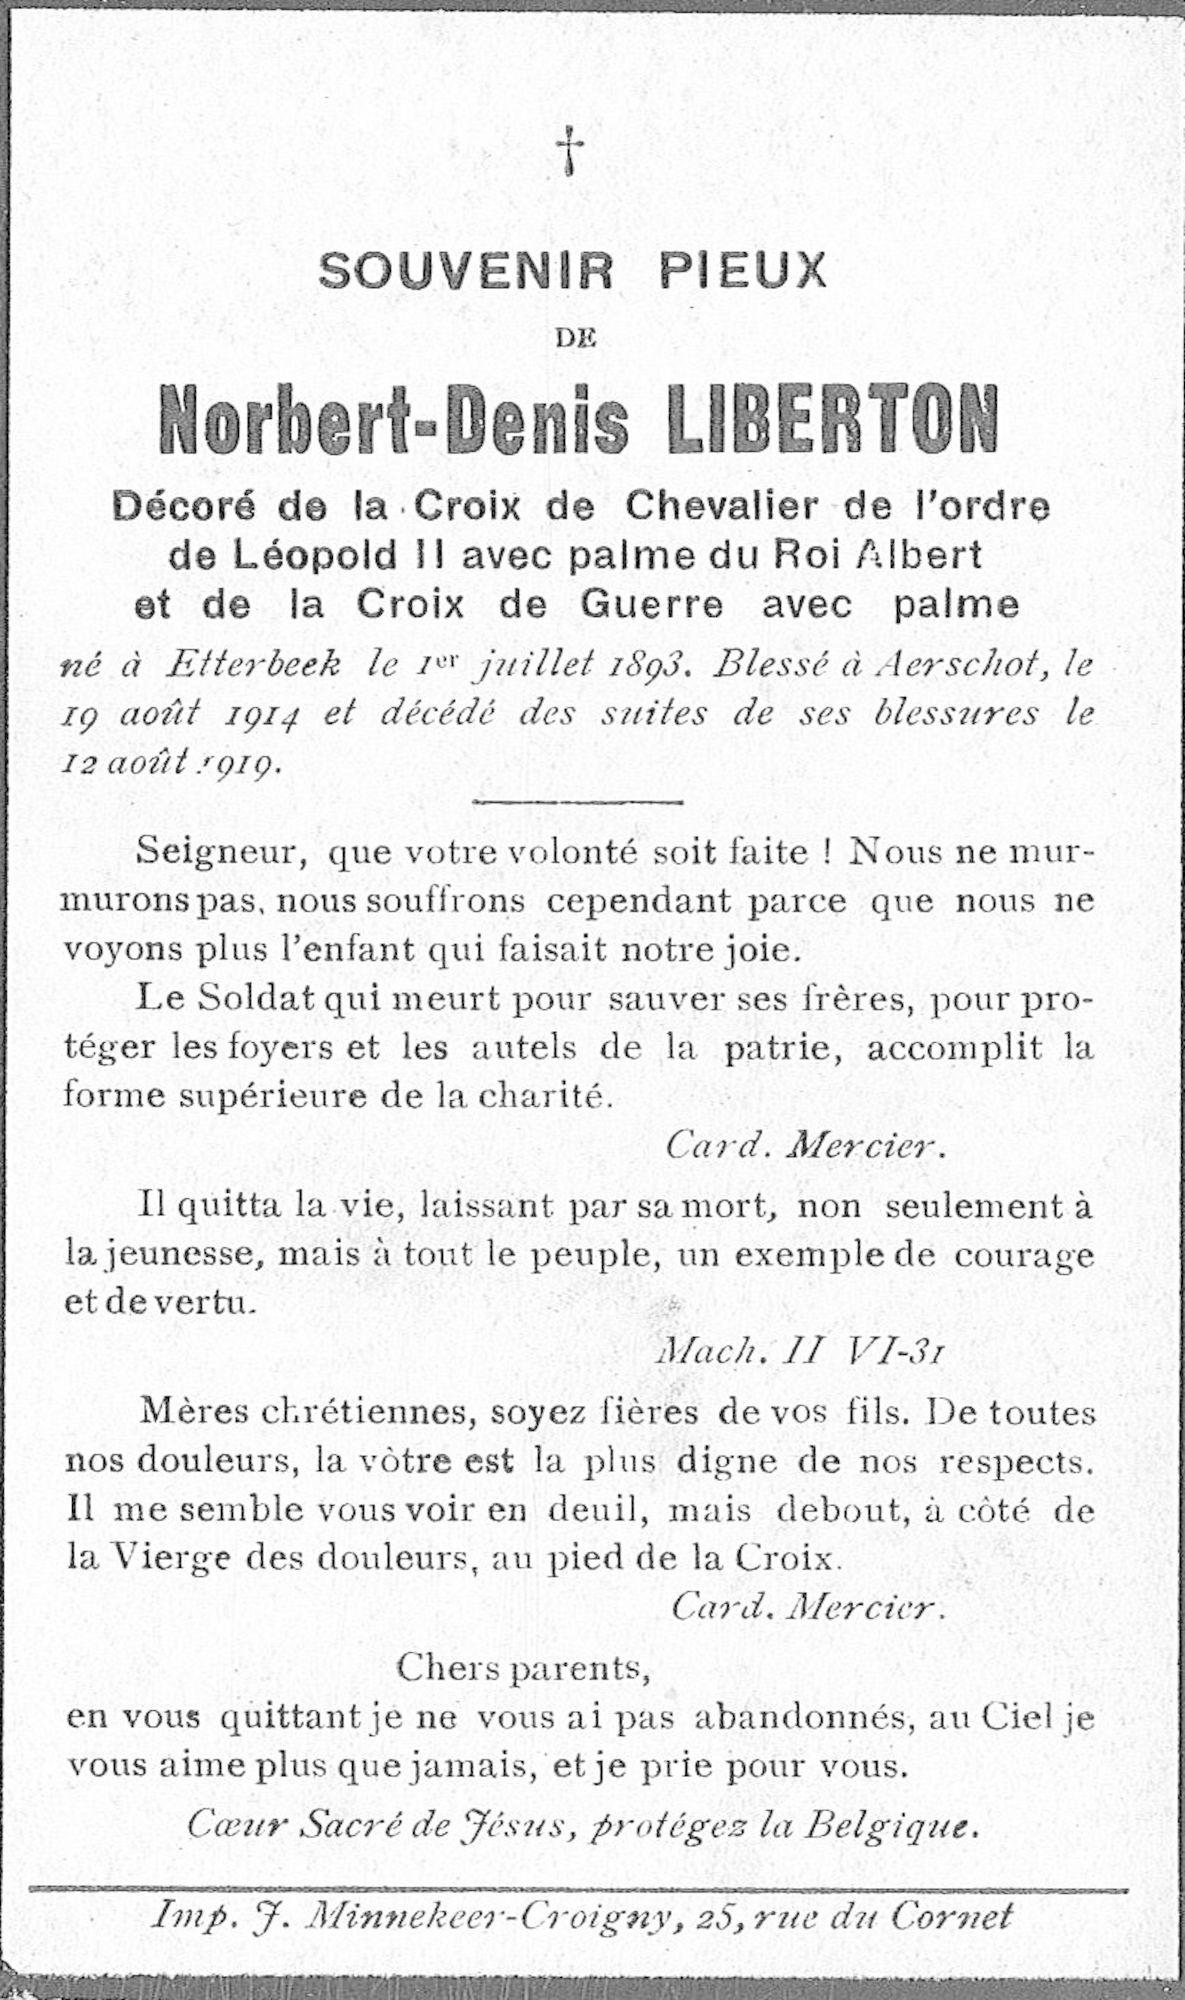 Norbert-Denis Liberton